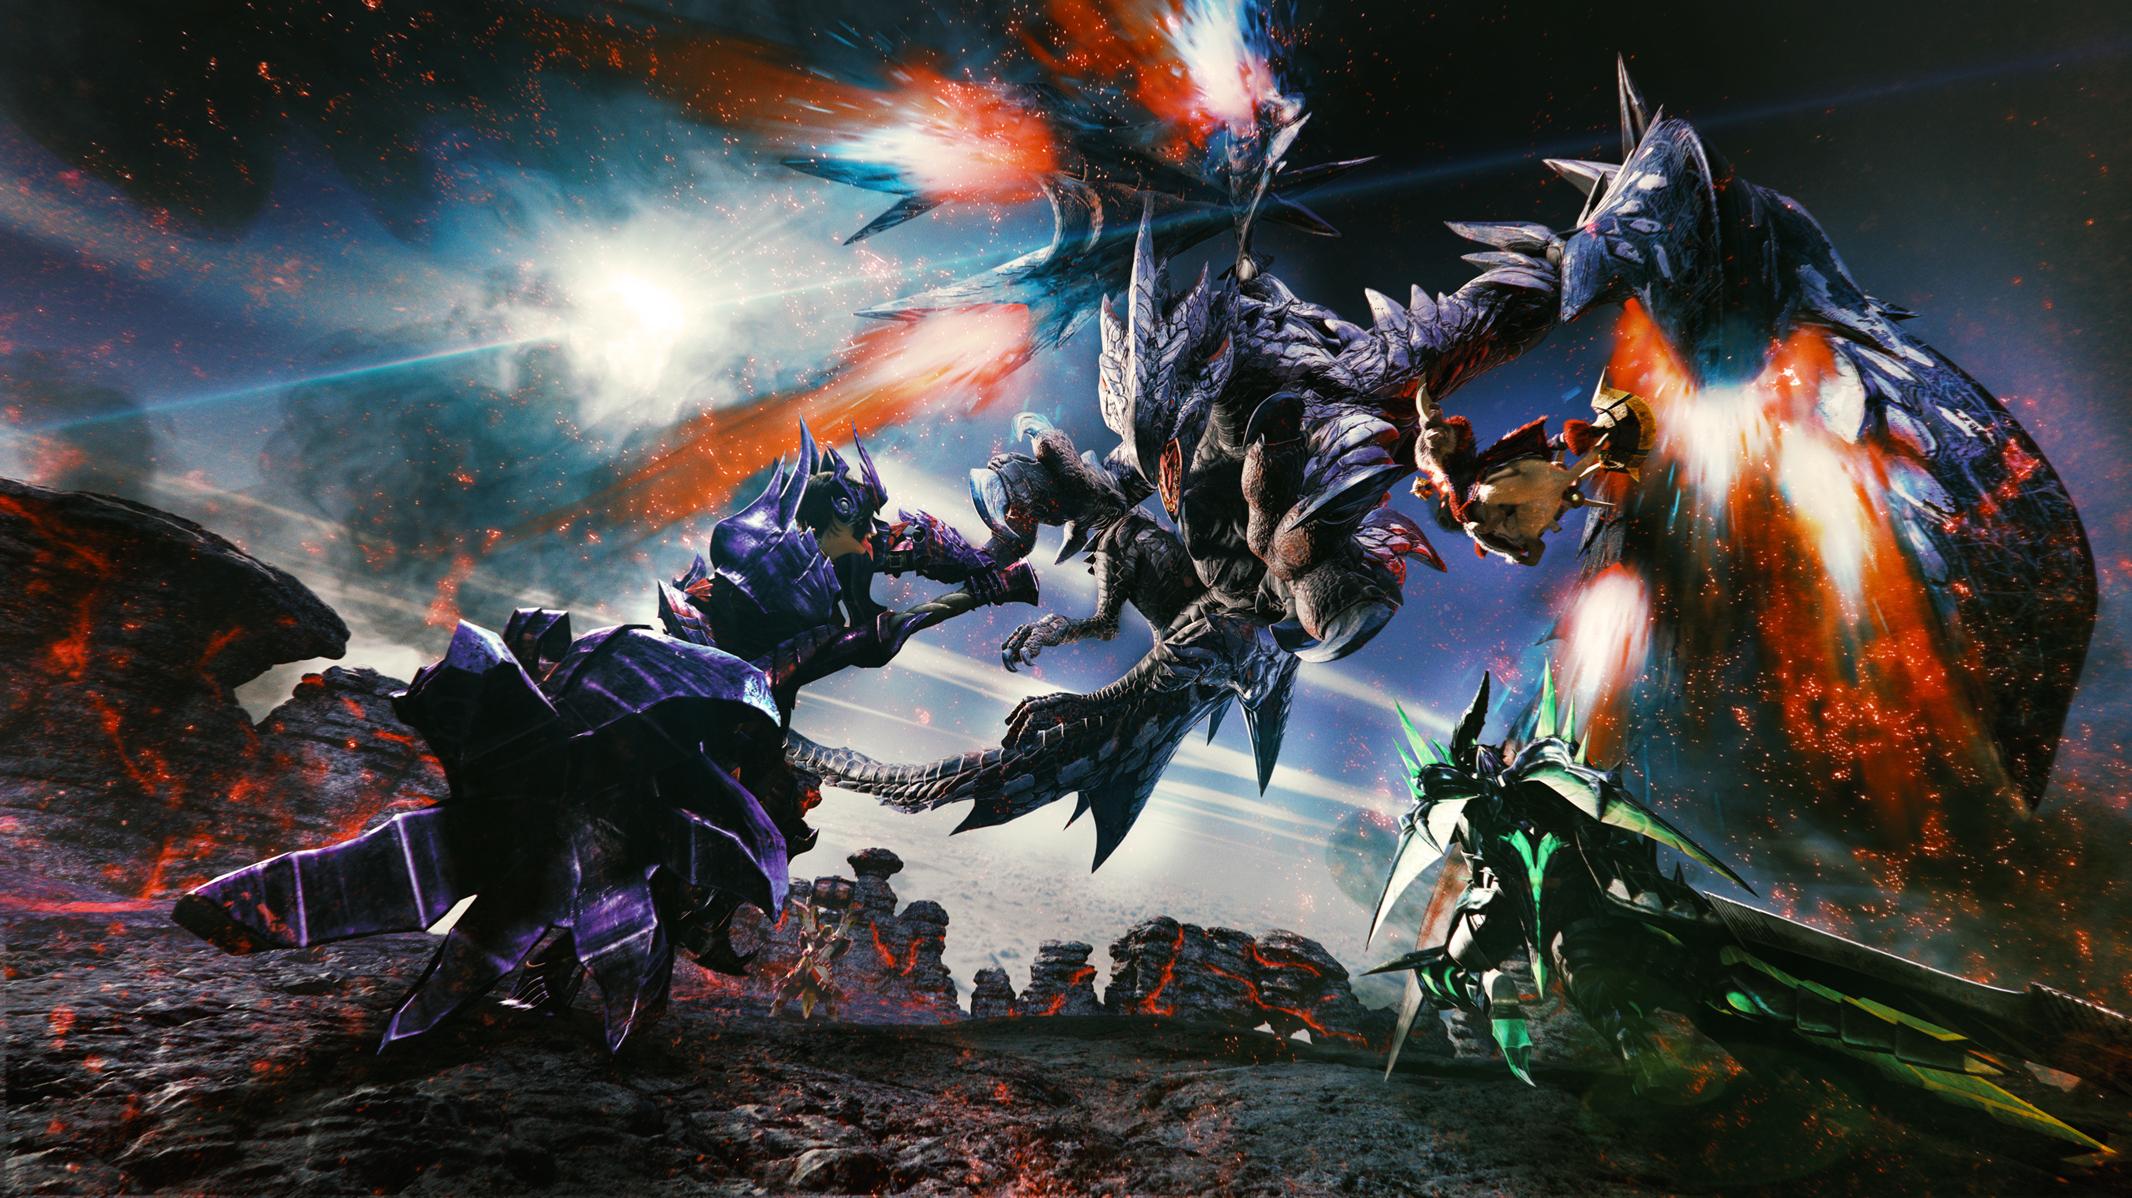 demo-monster-hunter-xx-nintendo-switch-ya-esta-disponible-japon-frikigamers.com